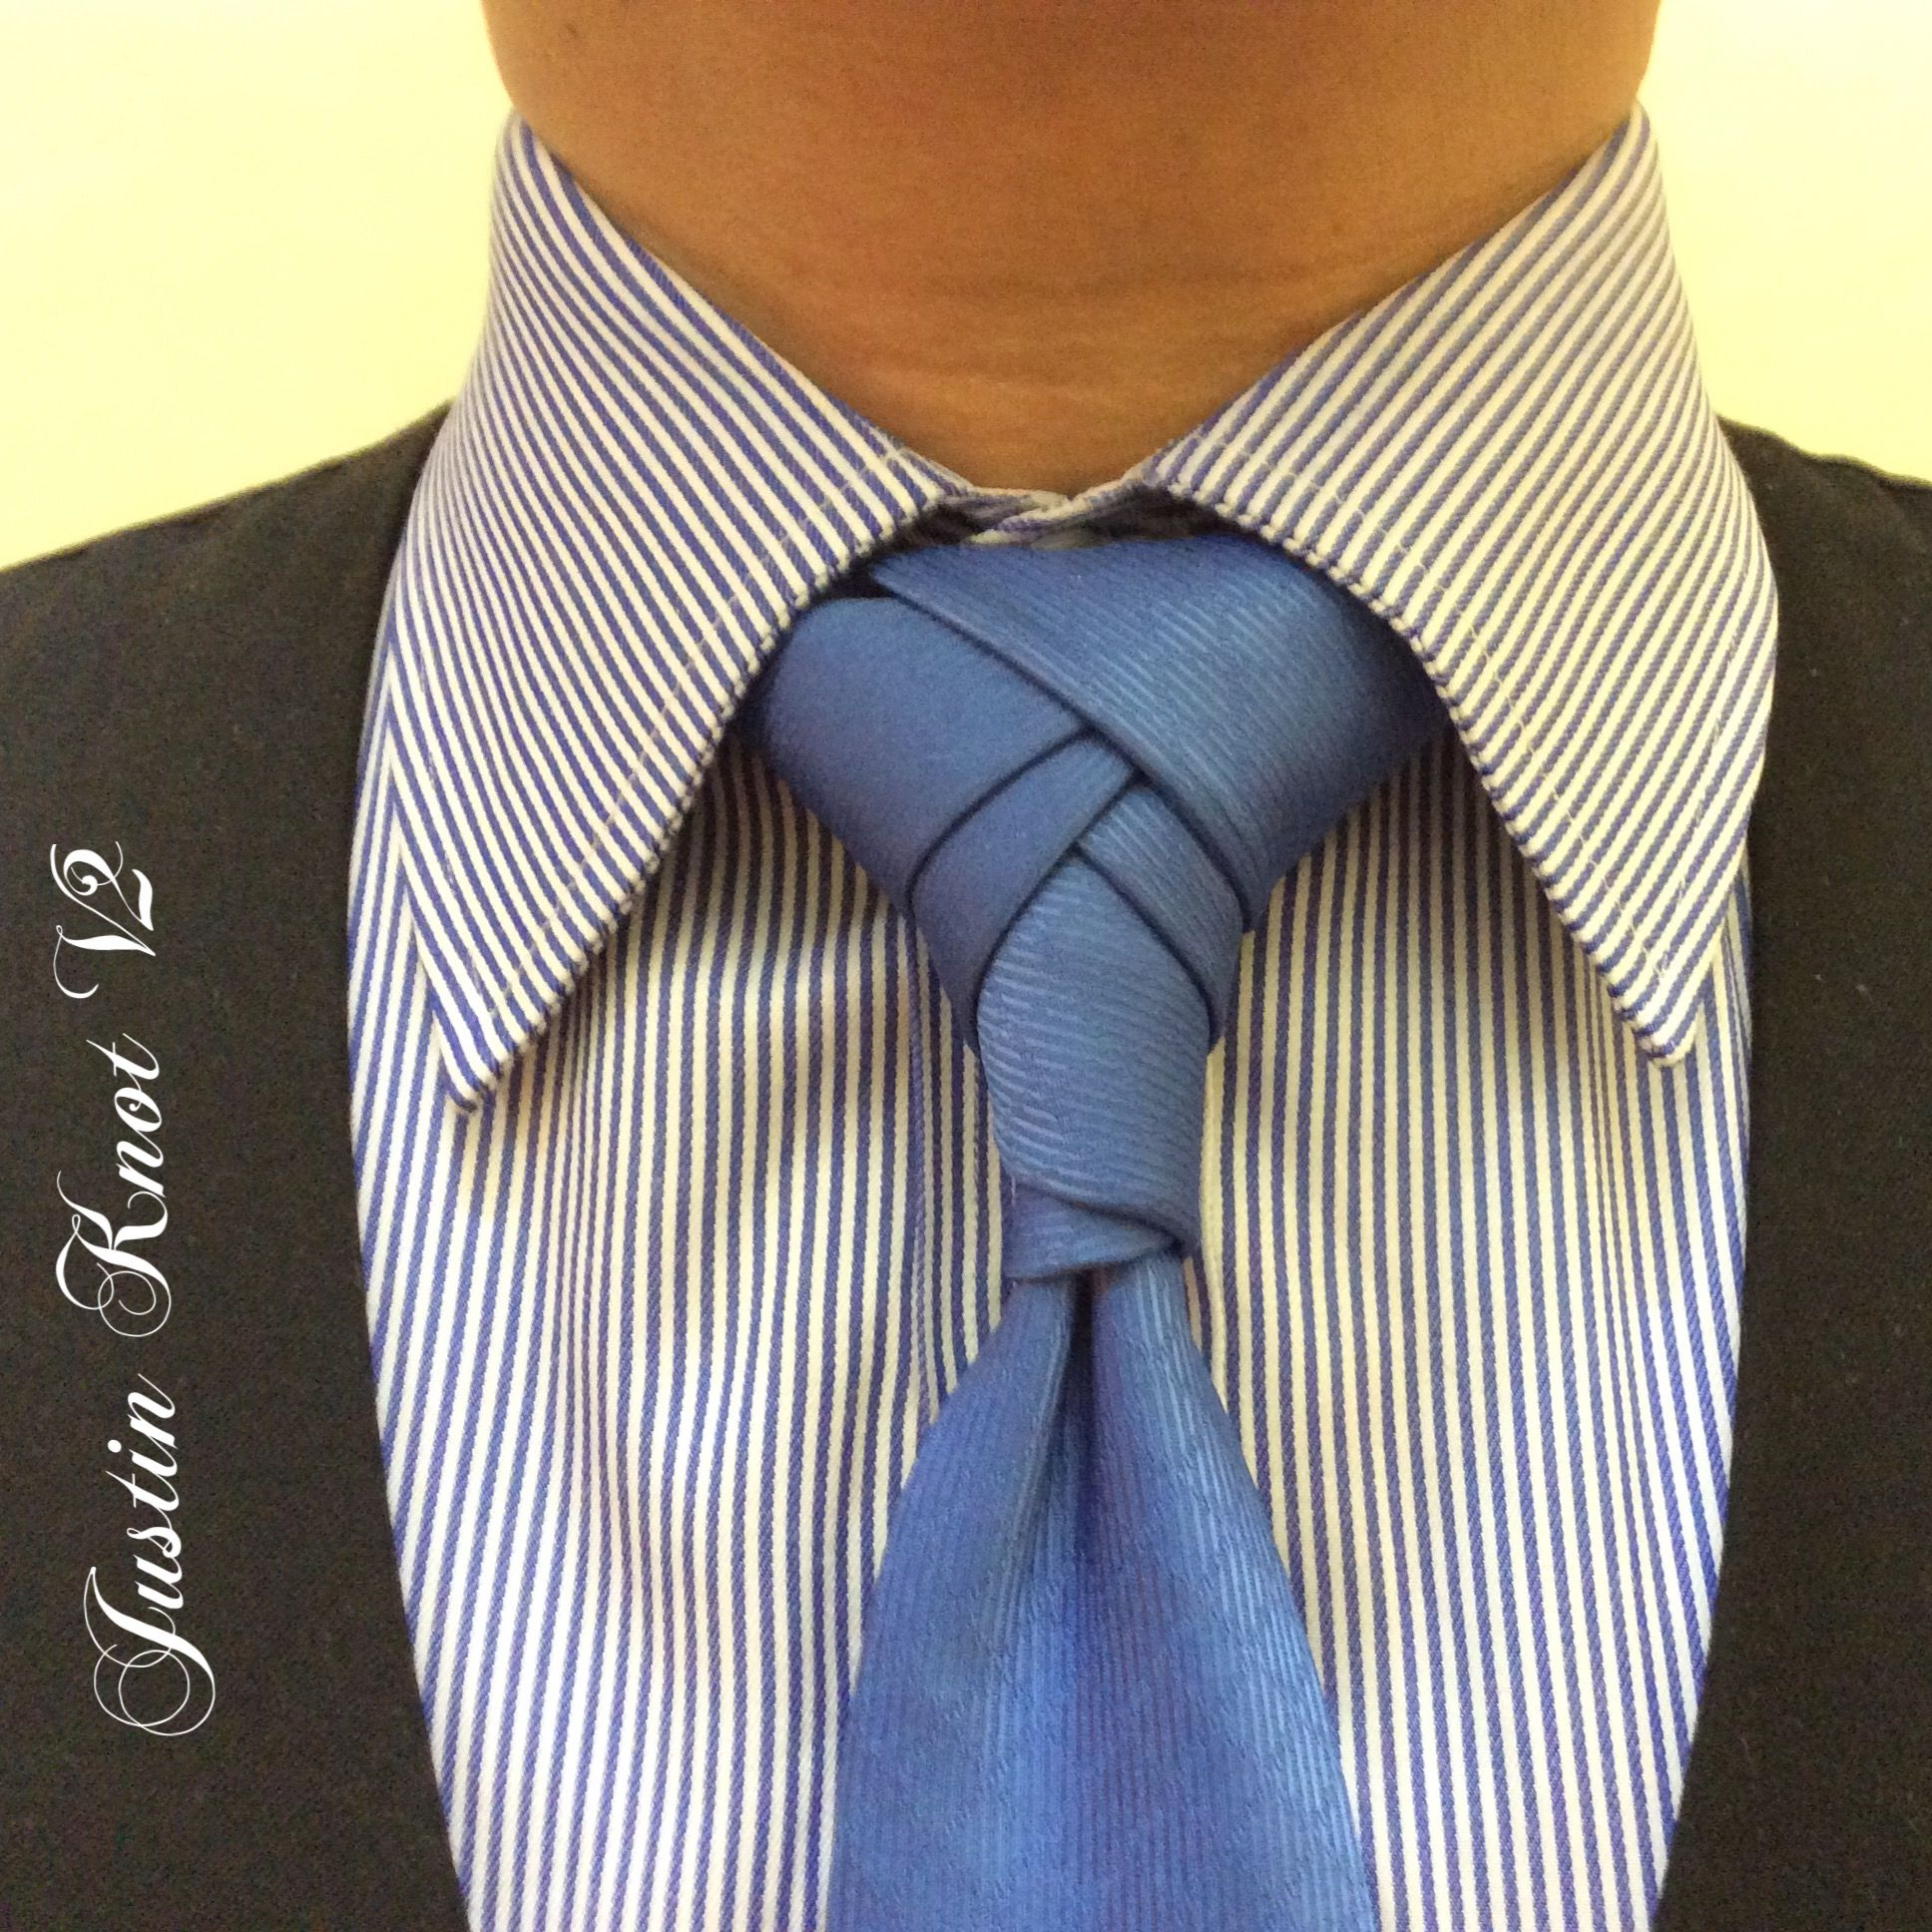 Justin Knot Version 2 created by Noel Junio. | Neck tie